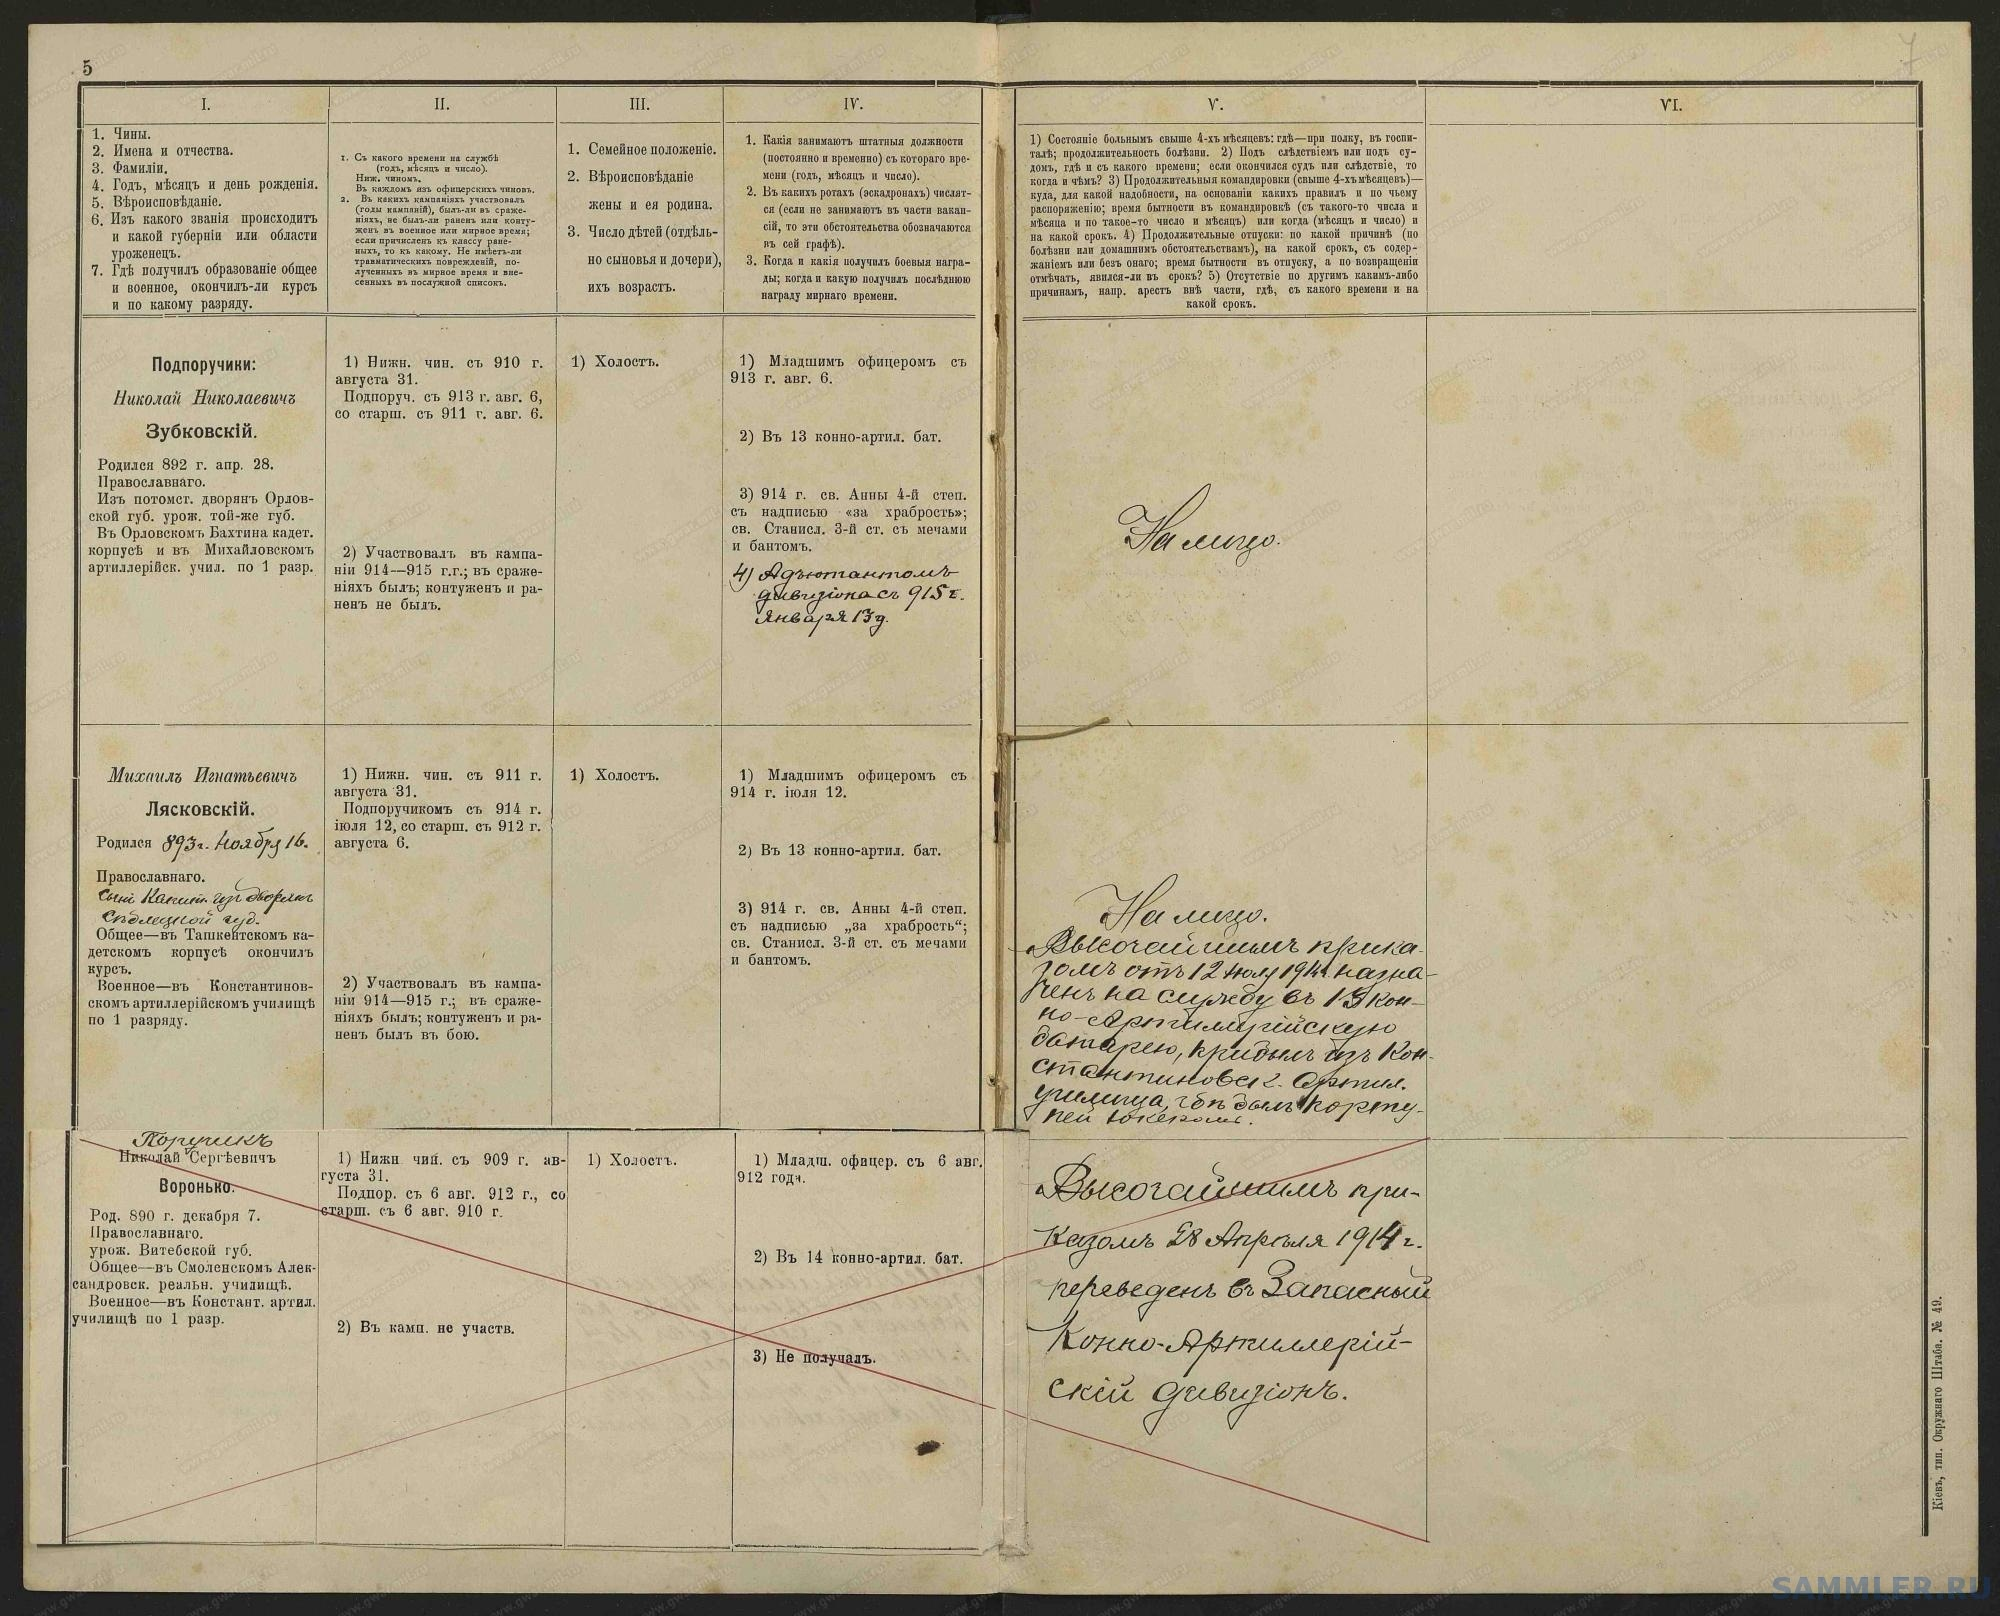 Список офицеров 7-го конно-артиллерийского дивизиона на 01.01.1915__09_.jpg